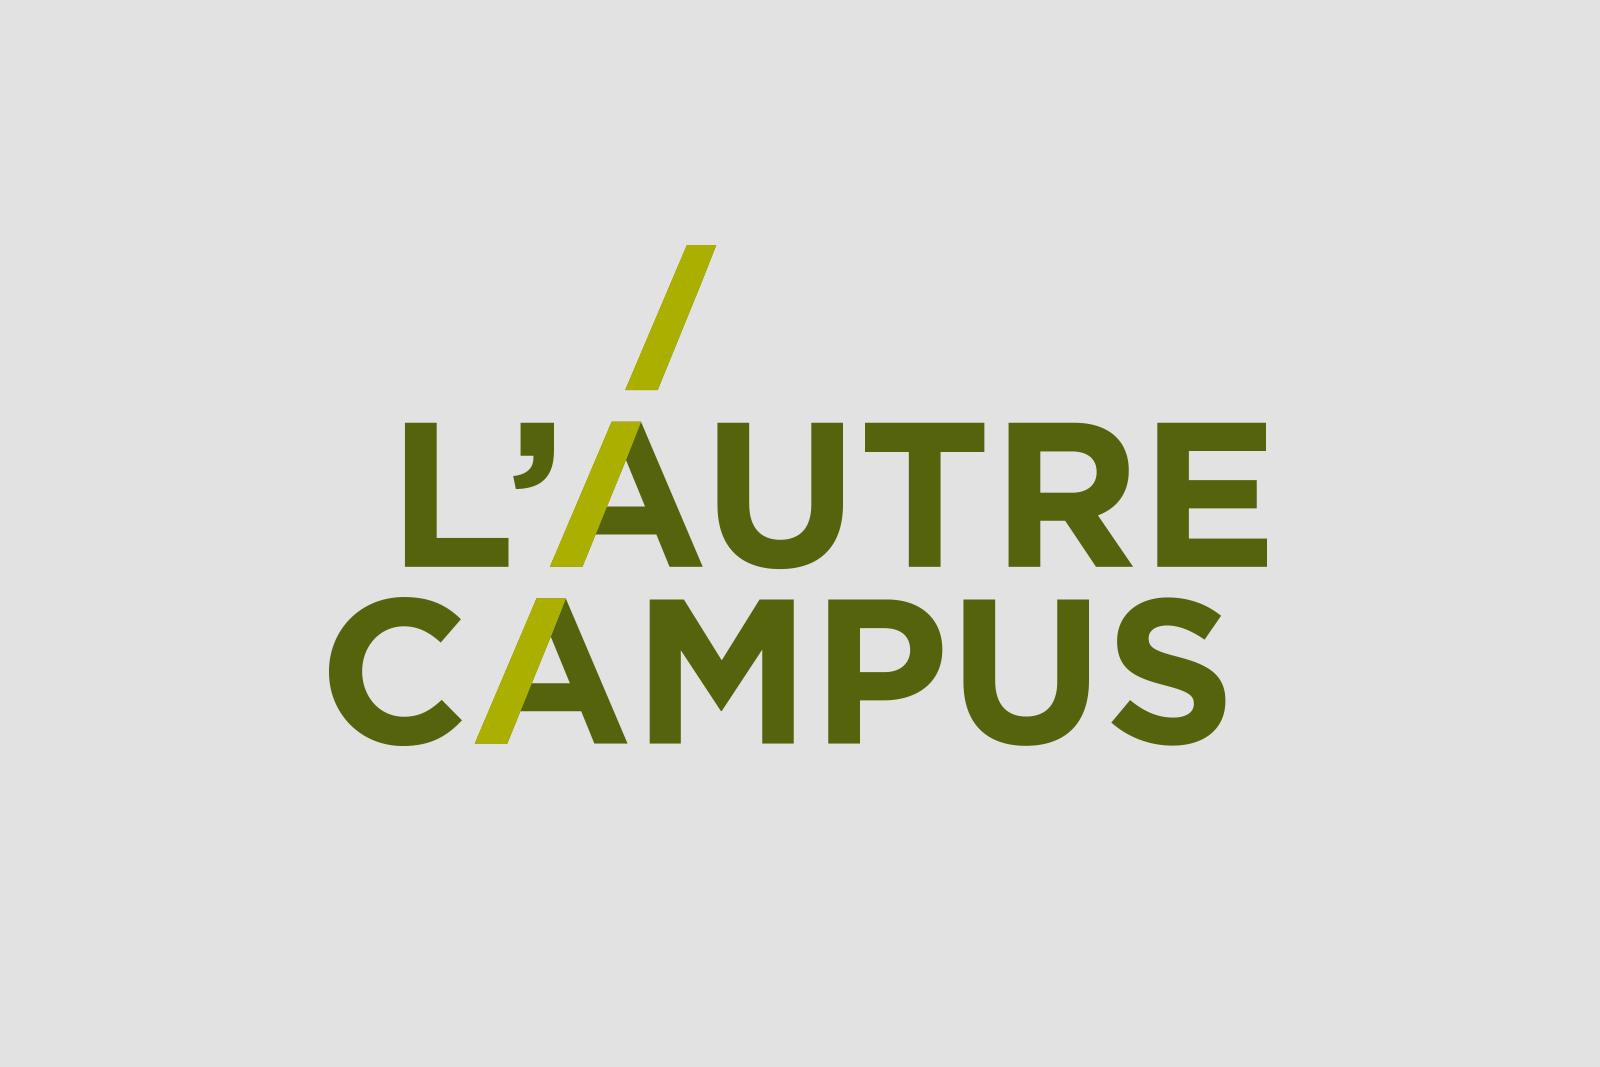 Josselintourette-LautreCampus-1